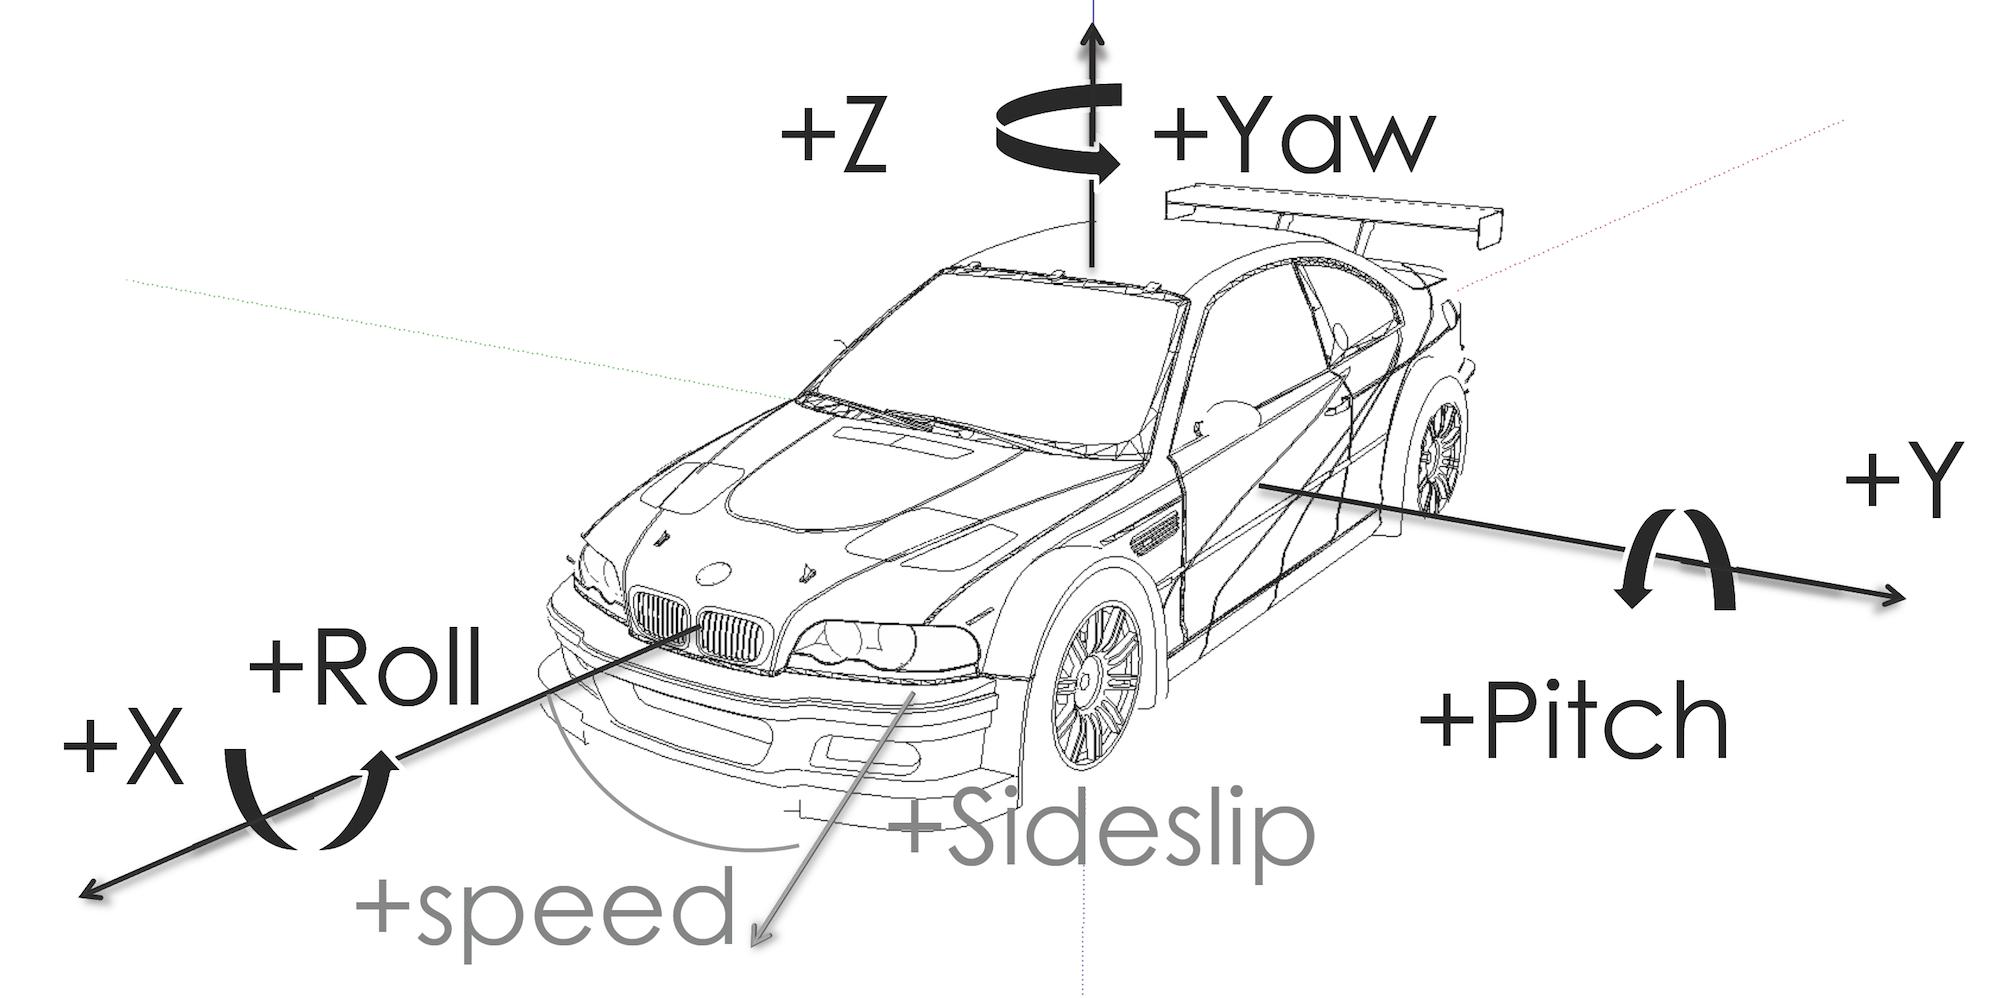 Fahrzeug Koordinatensystem nach DIN70000